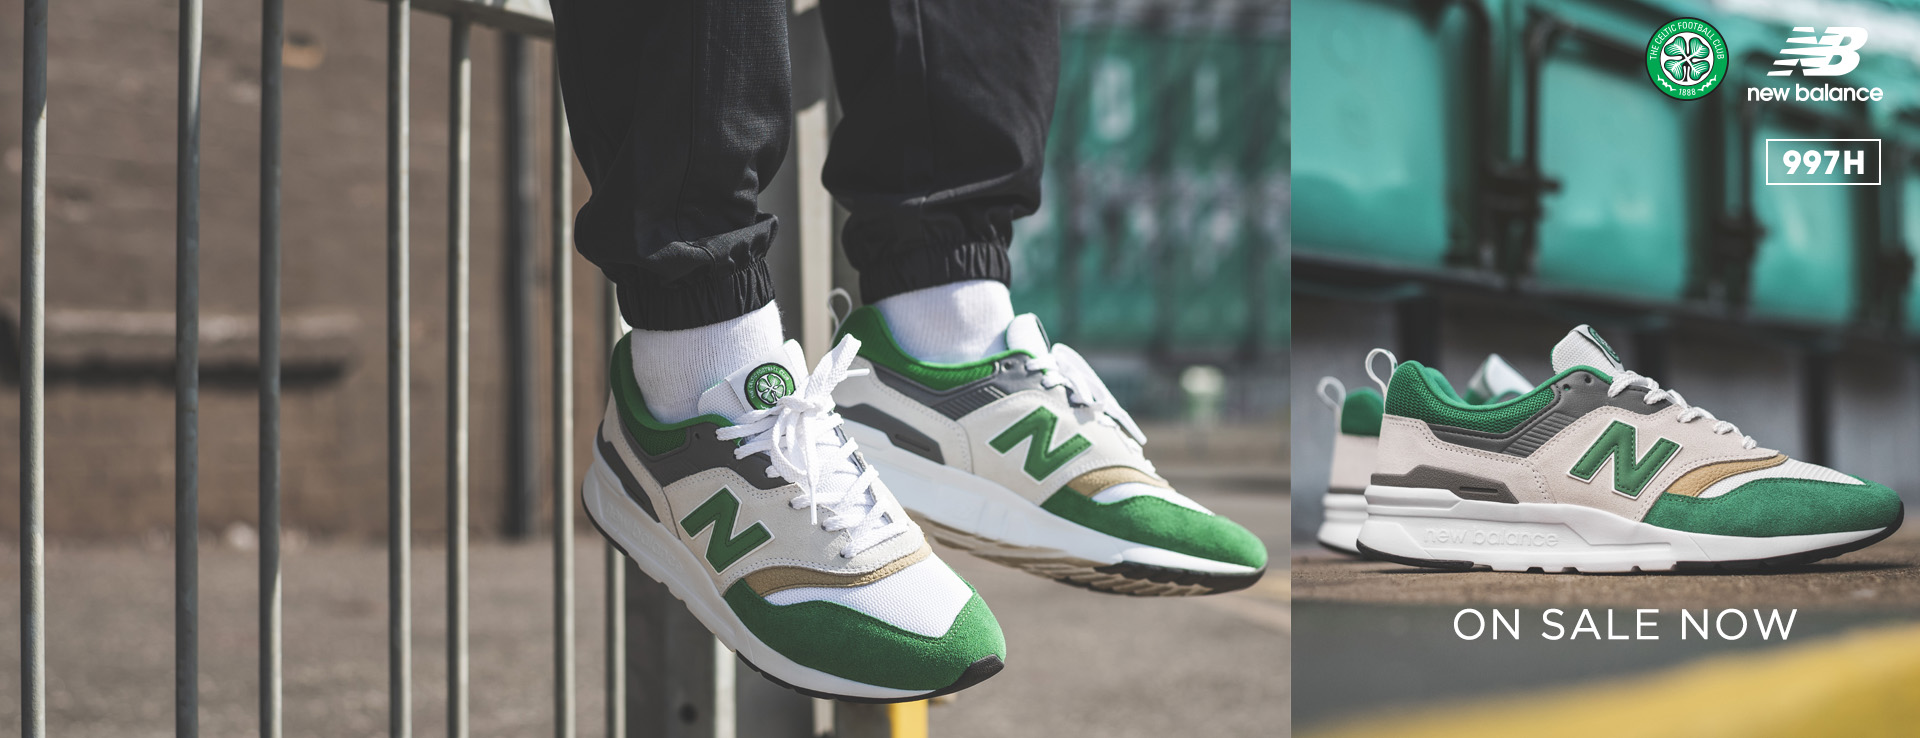 Celtic NB 997 Trainer